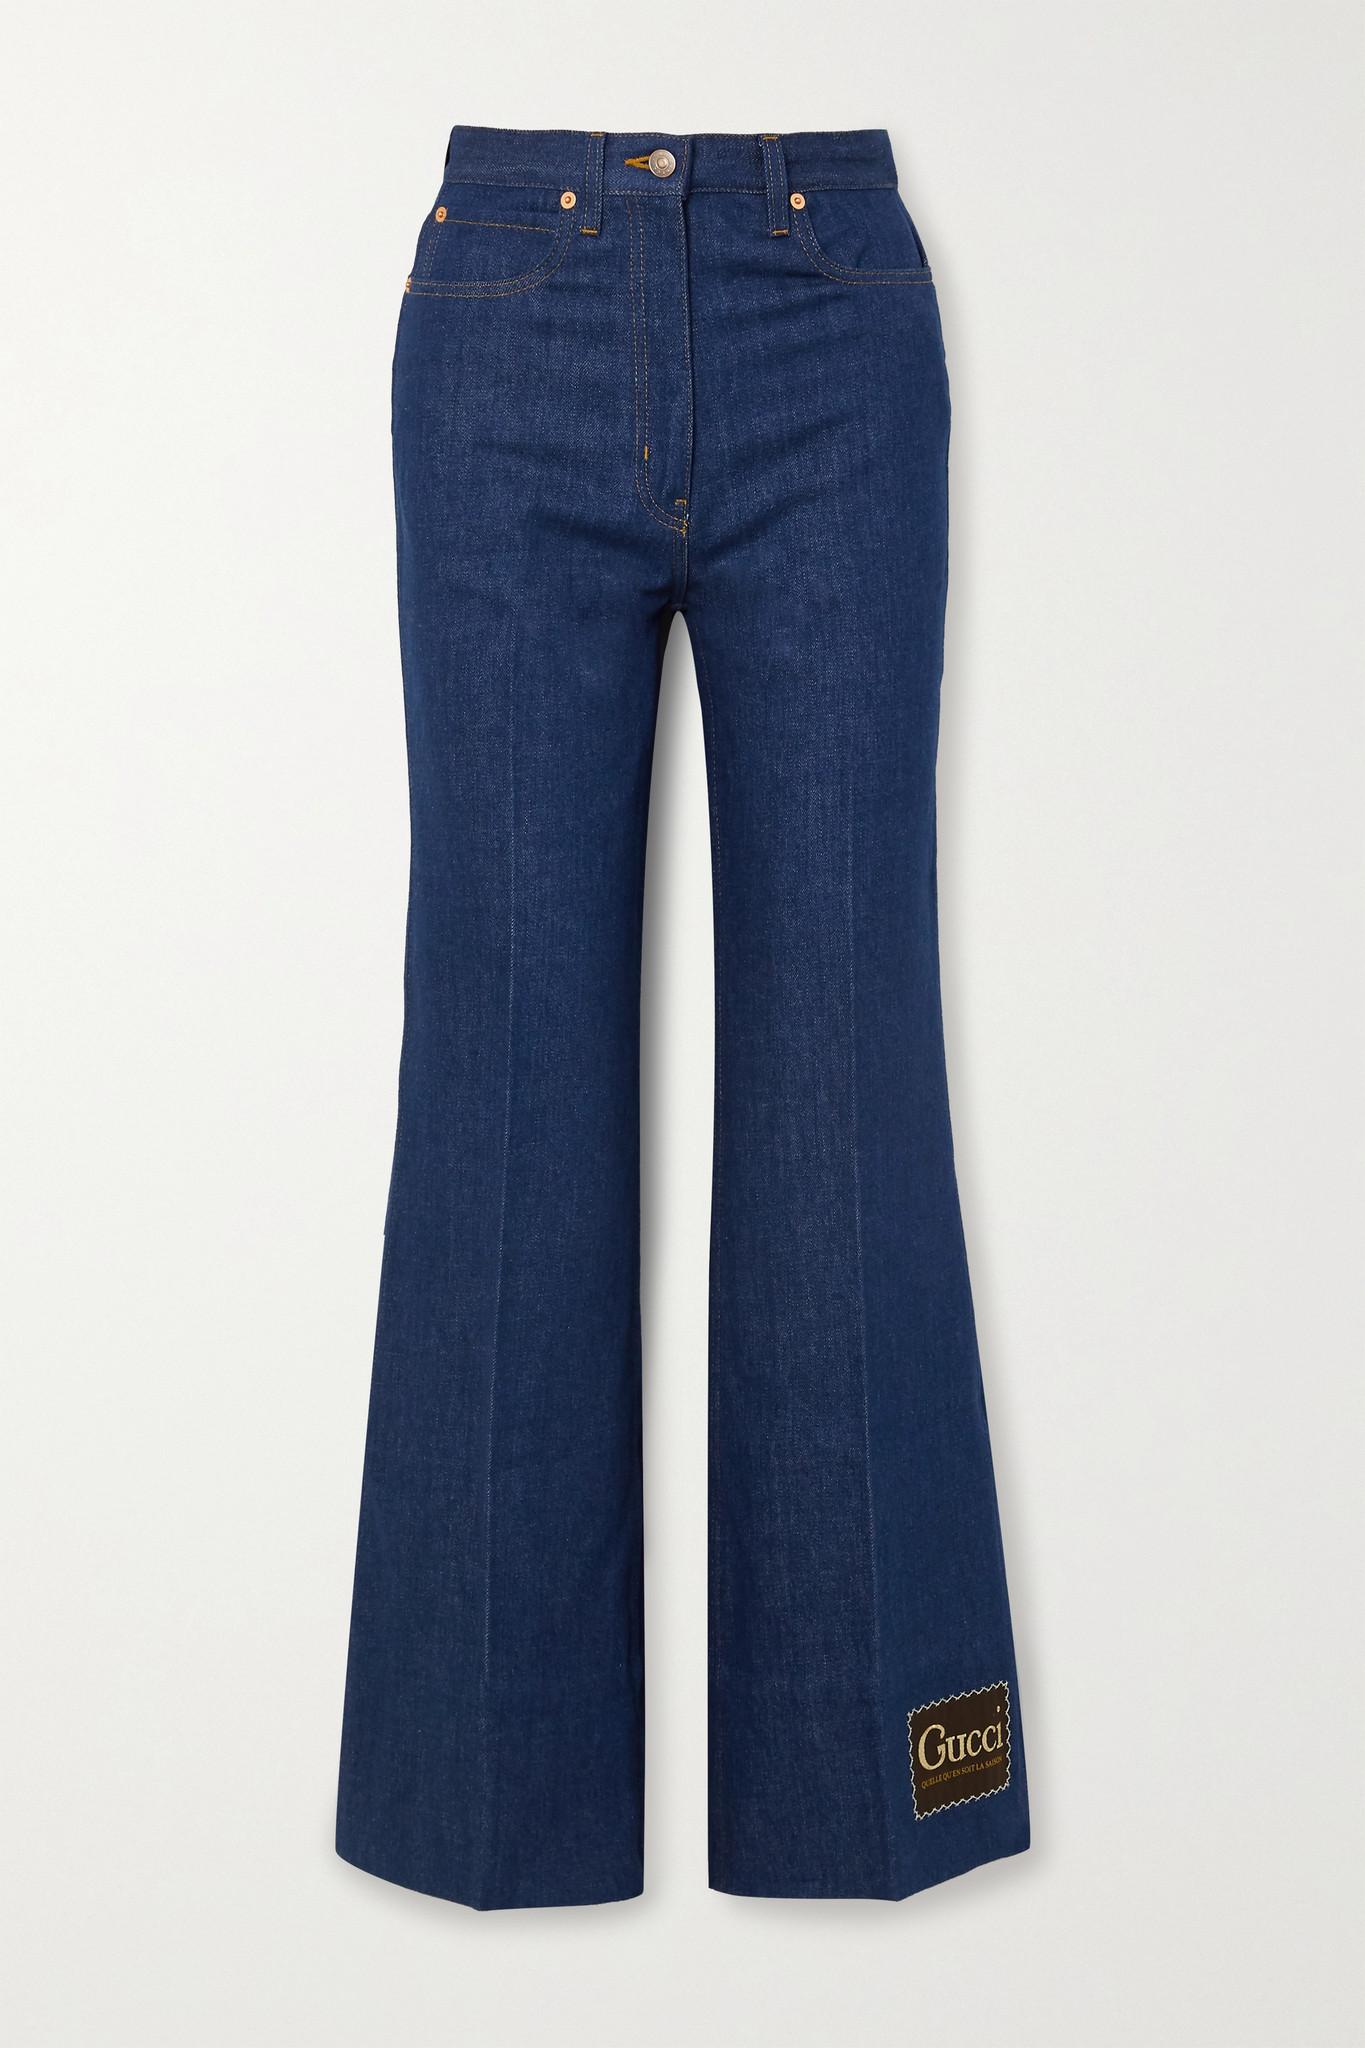 GUCCI - Appliquéd High-rise Wide-leg Jeans - Blue - 28